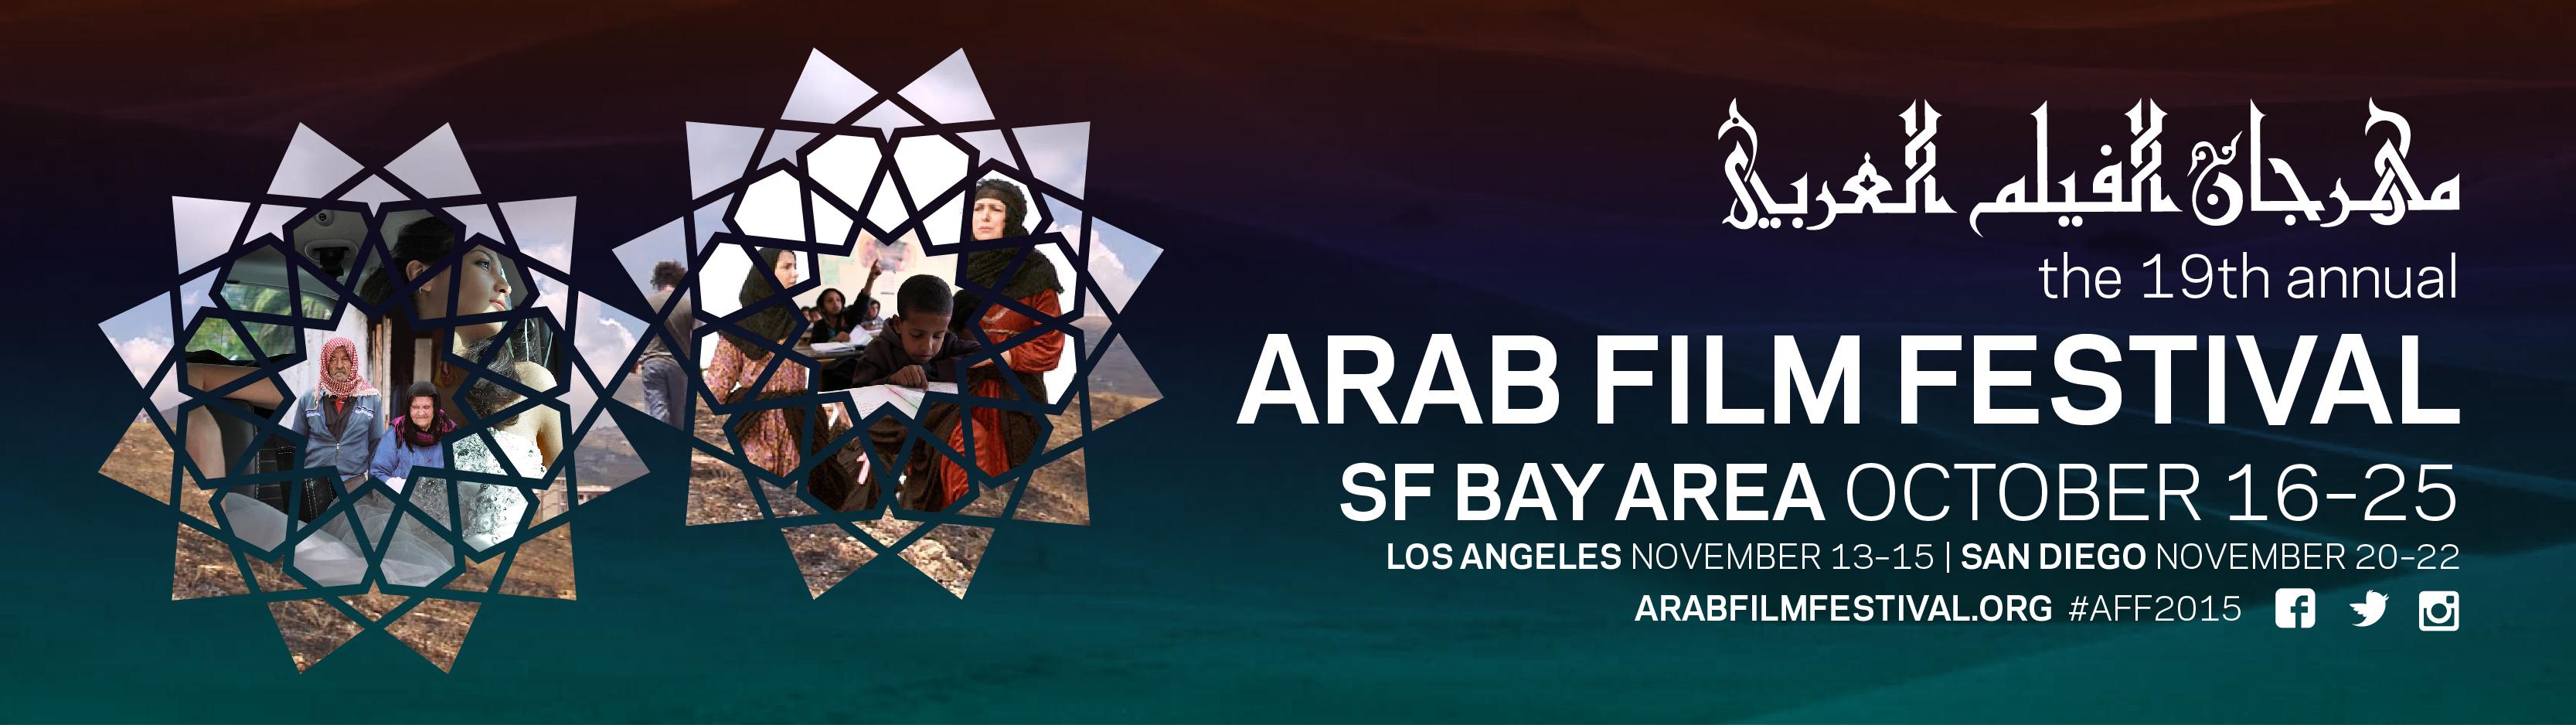 Arab Film Festival 2015